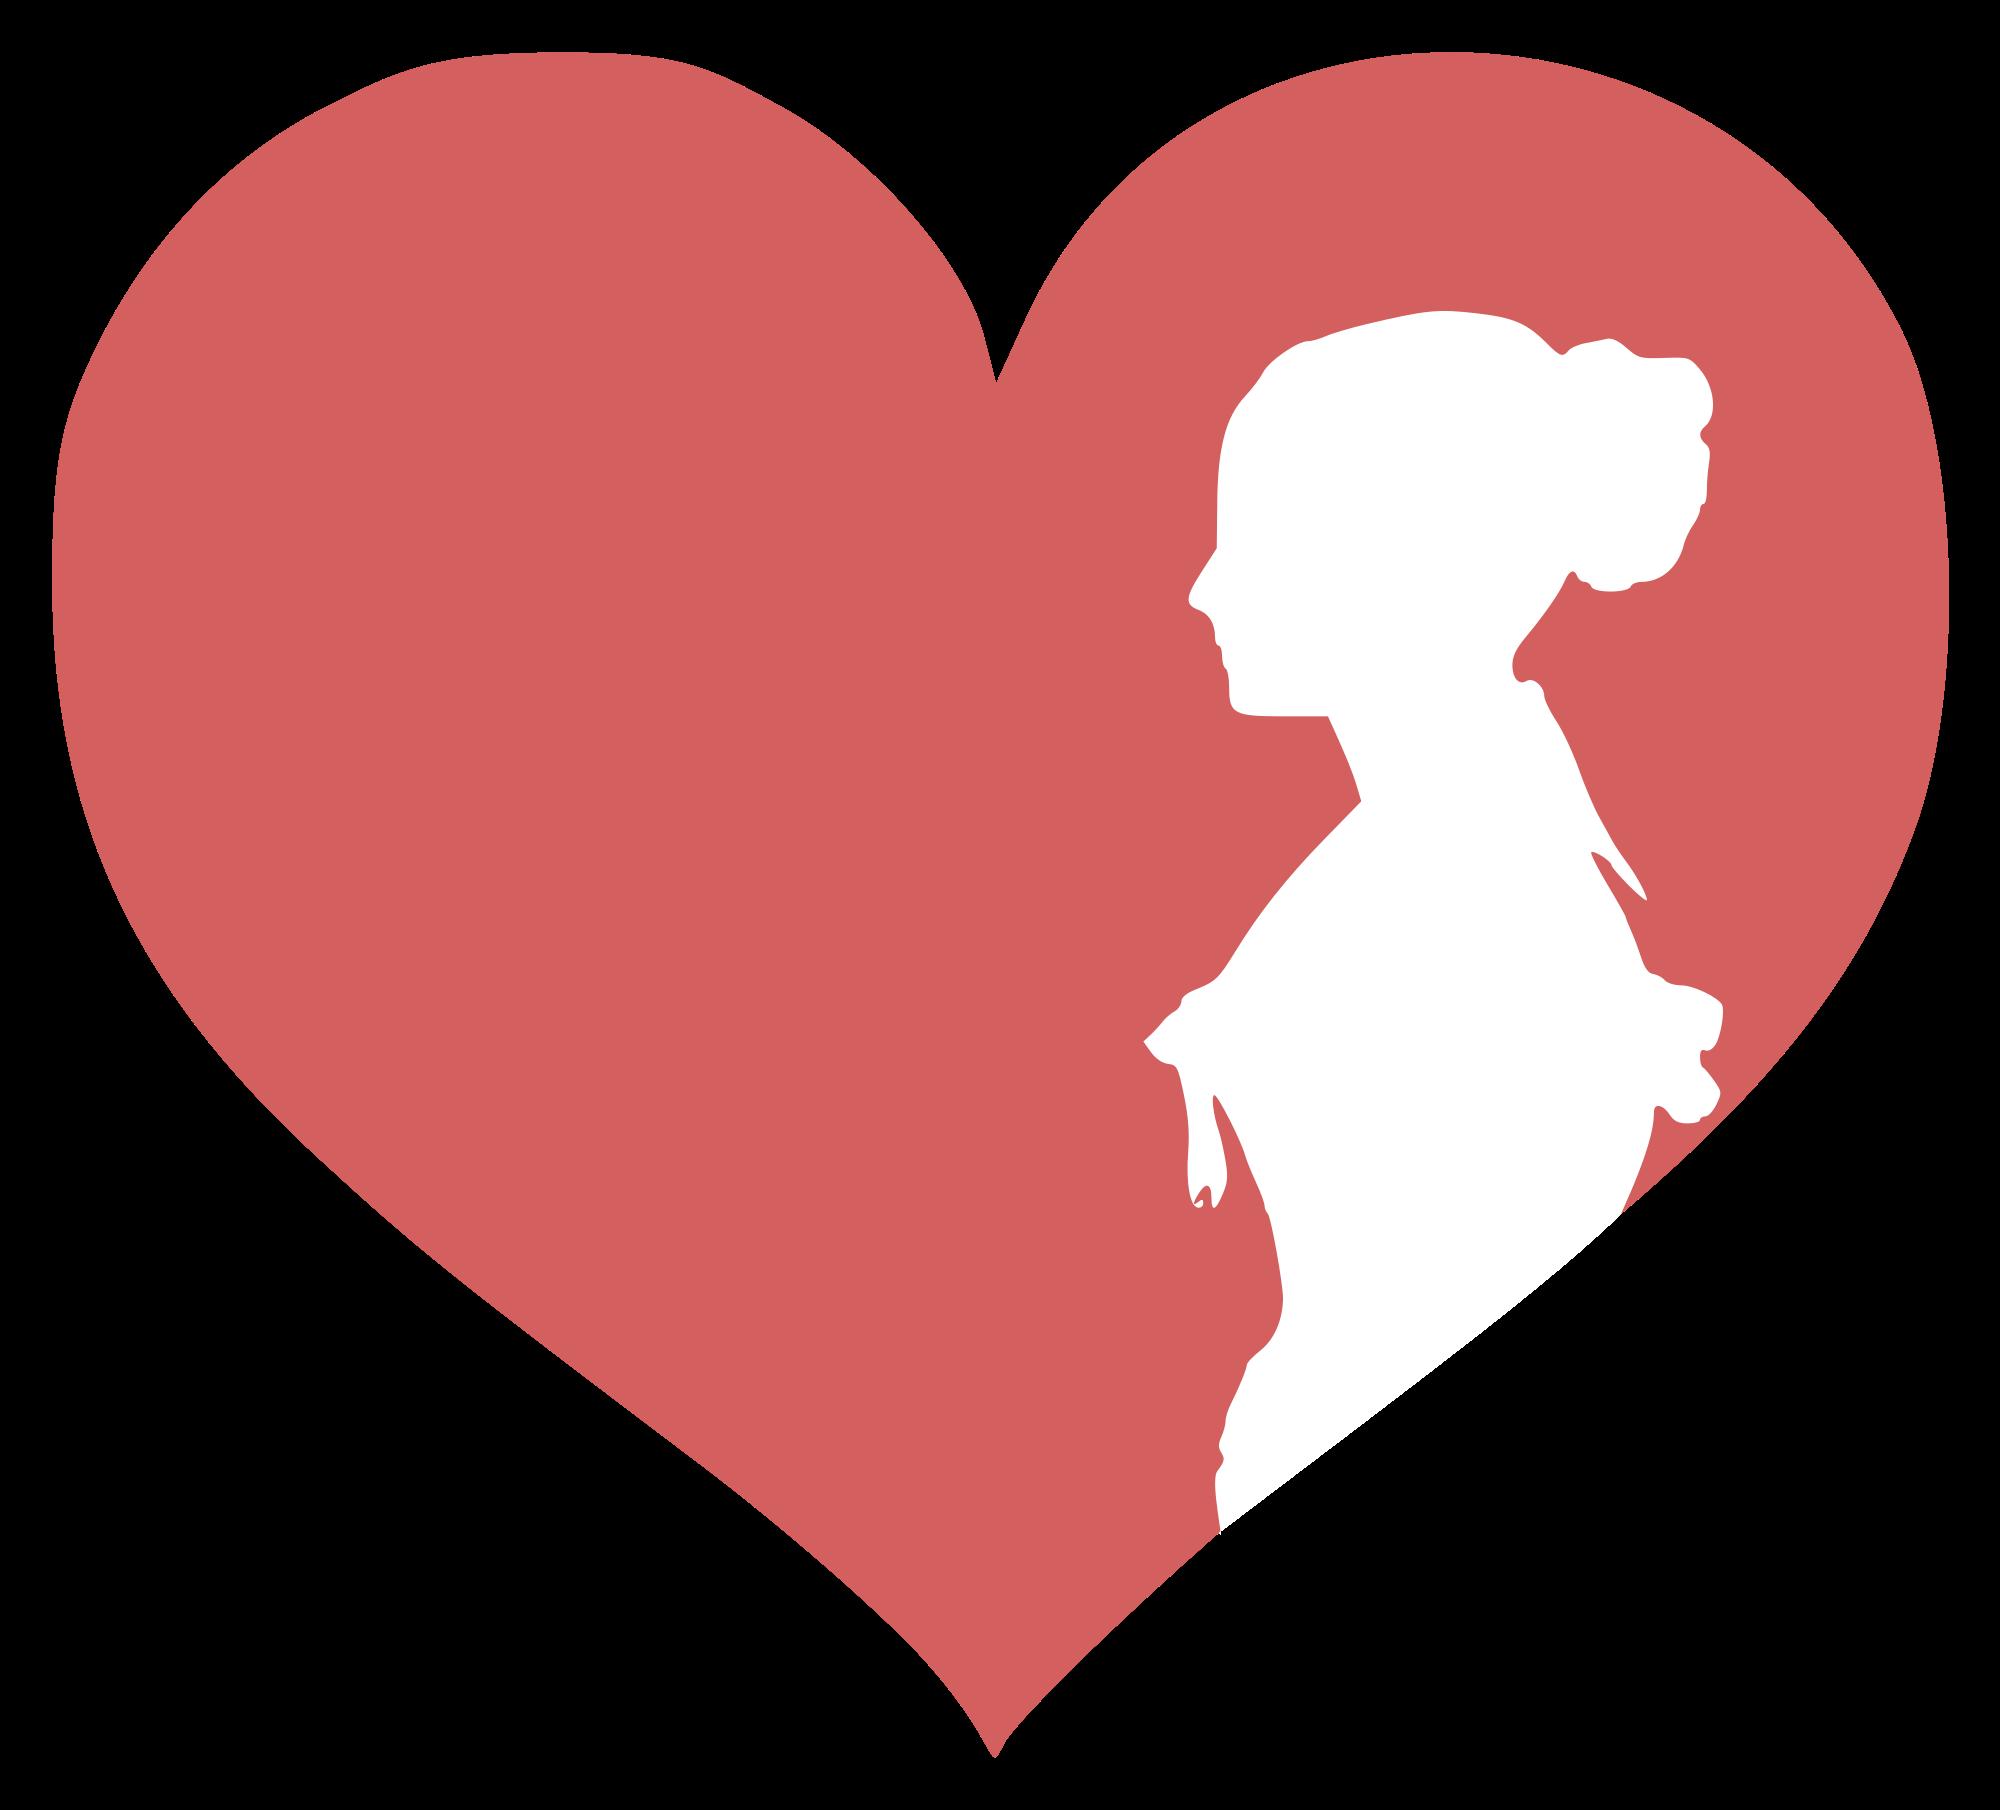 Heat clipart romantic. Women logo silhouette at